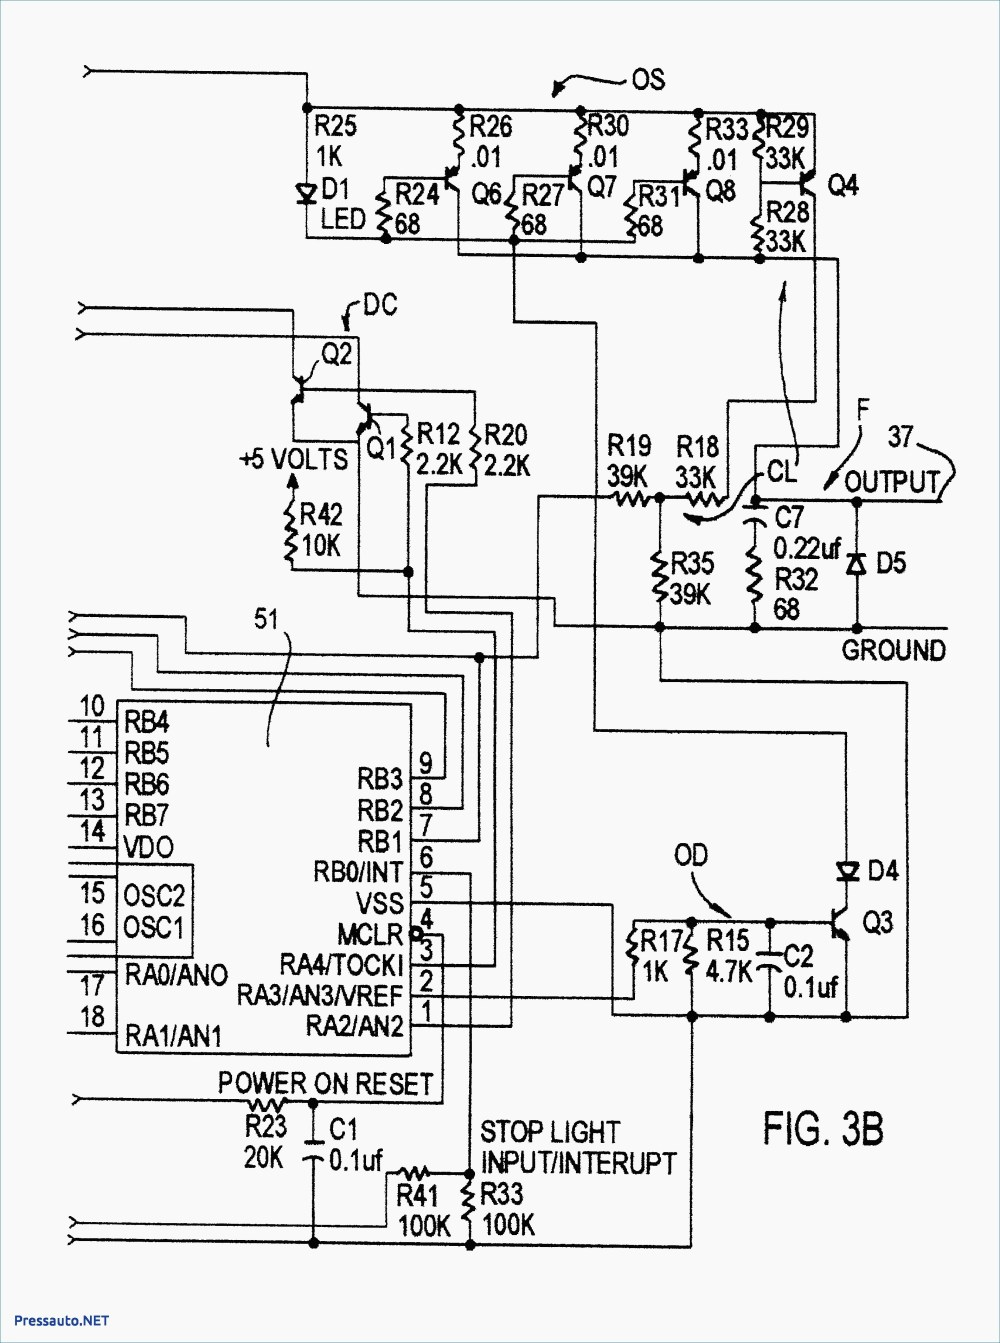 medium resolution of sunpro pyrometer wiring diagram diagrams instructions napa flasher wiring diagram wiring wiring diagrams instructions from harley davidson charging system